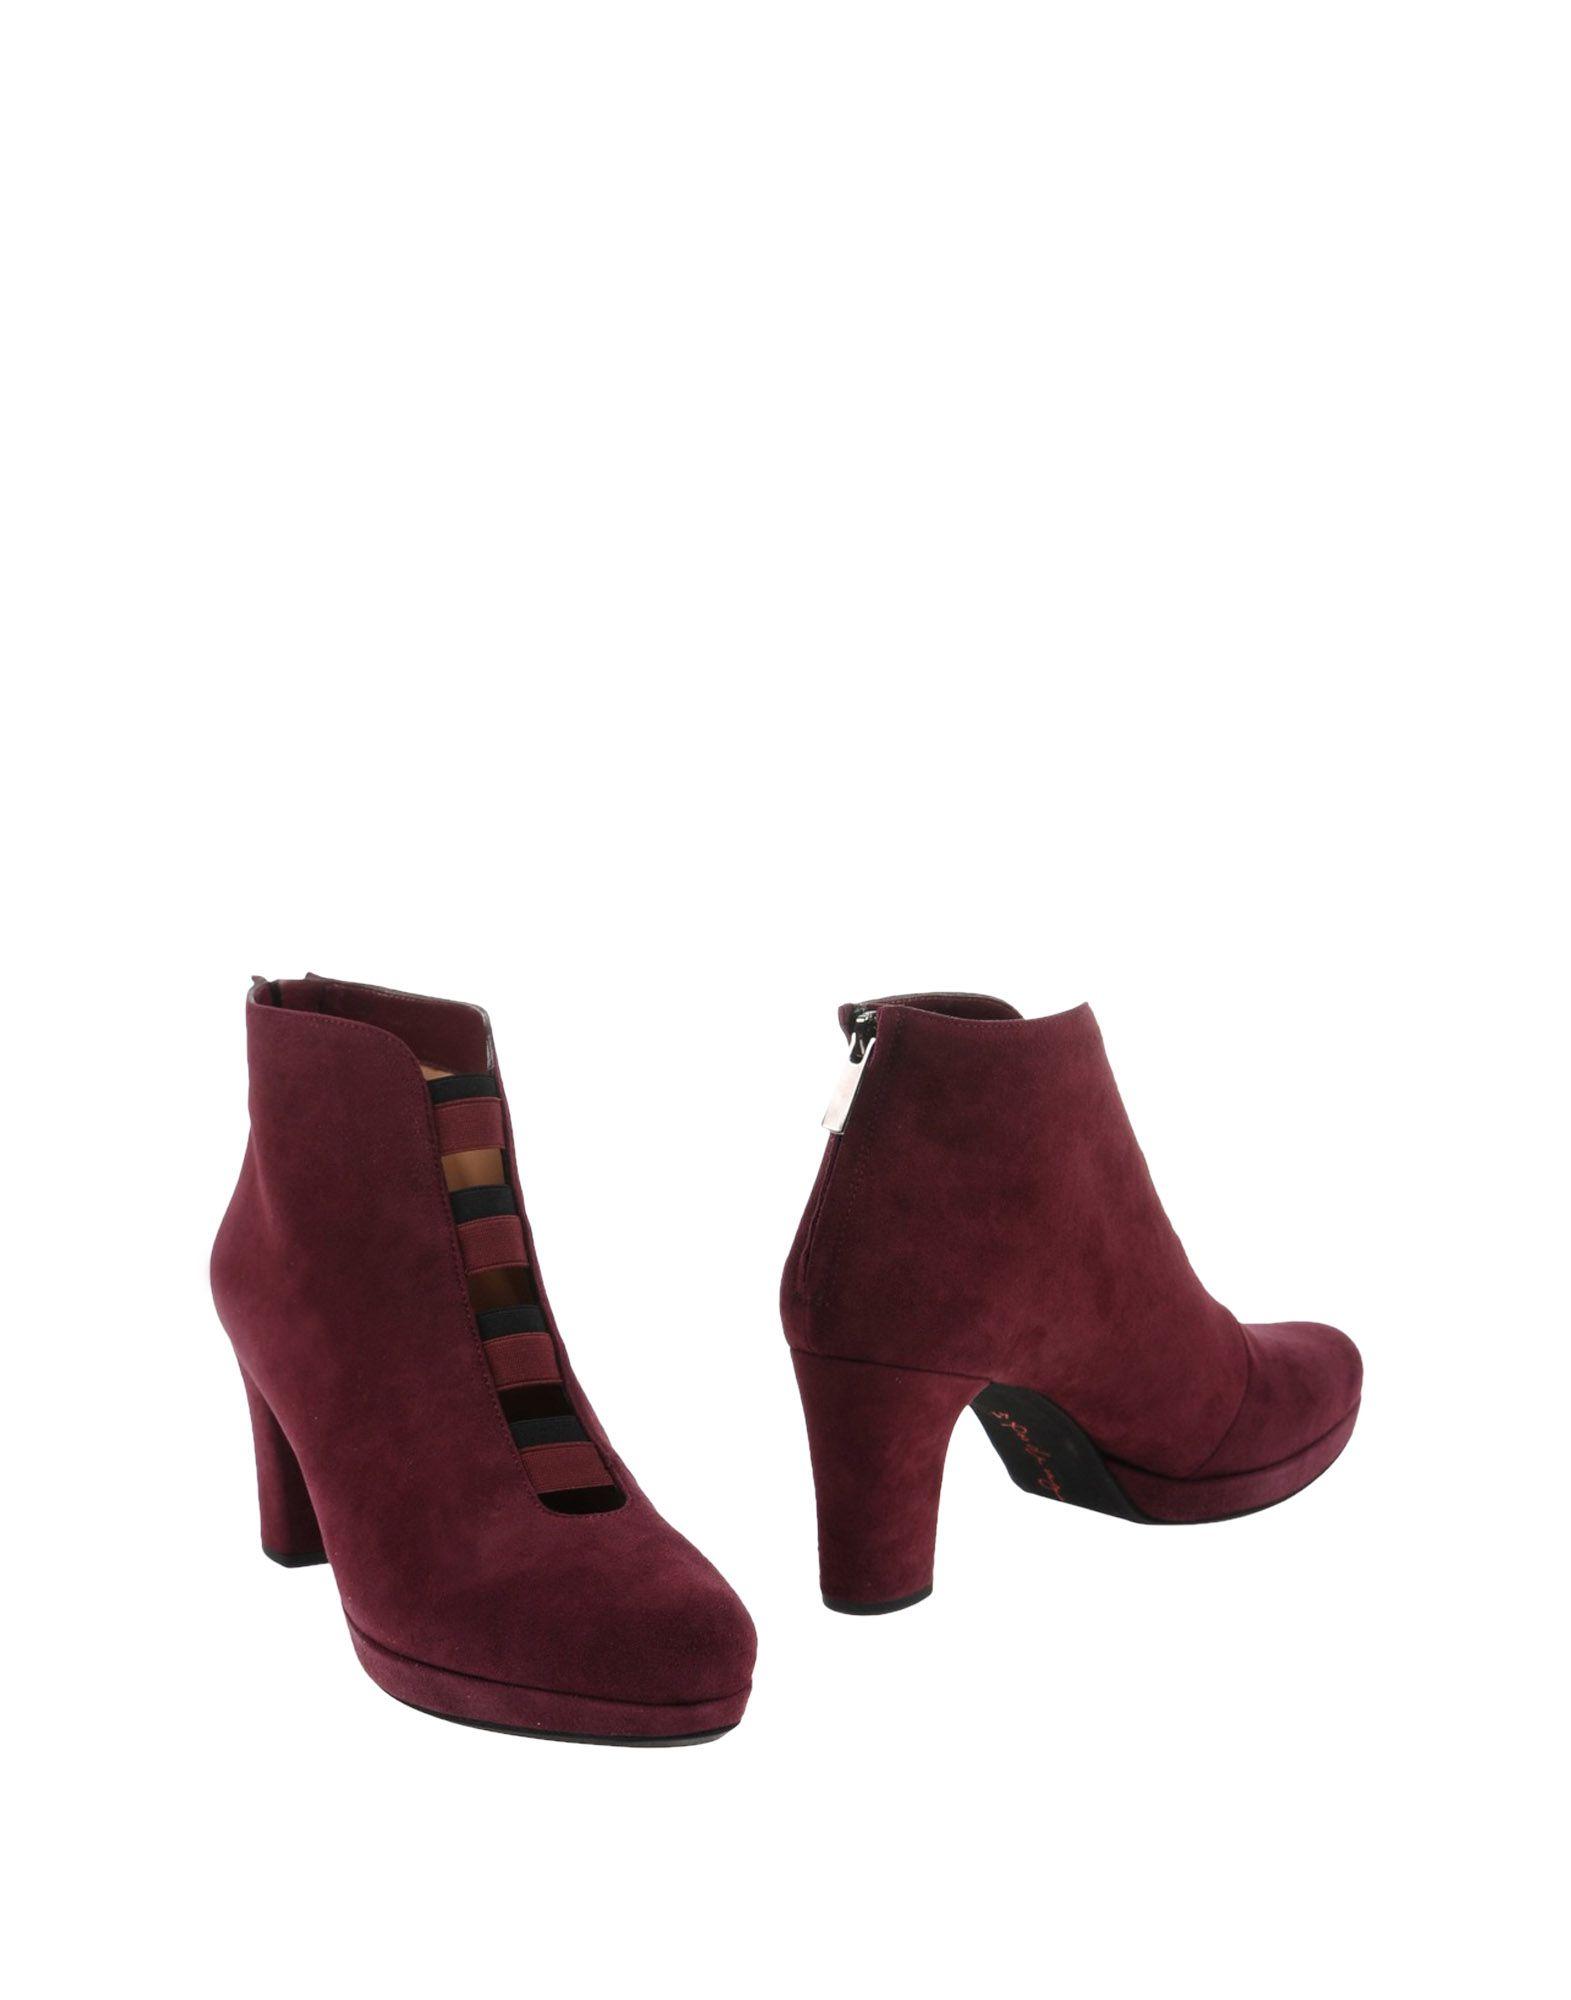 Pas De Rouge Stiefelette Damen  11260236OS Schuhe Neue Schuhe 11260236OS dc2fab